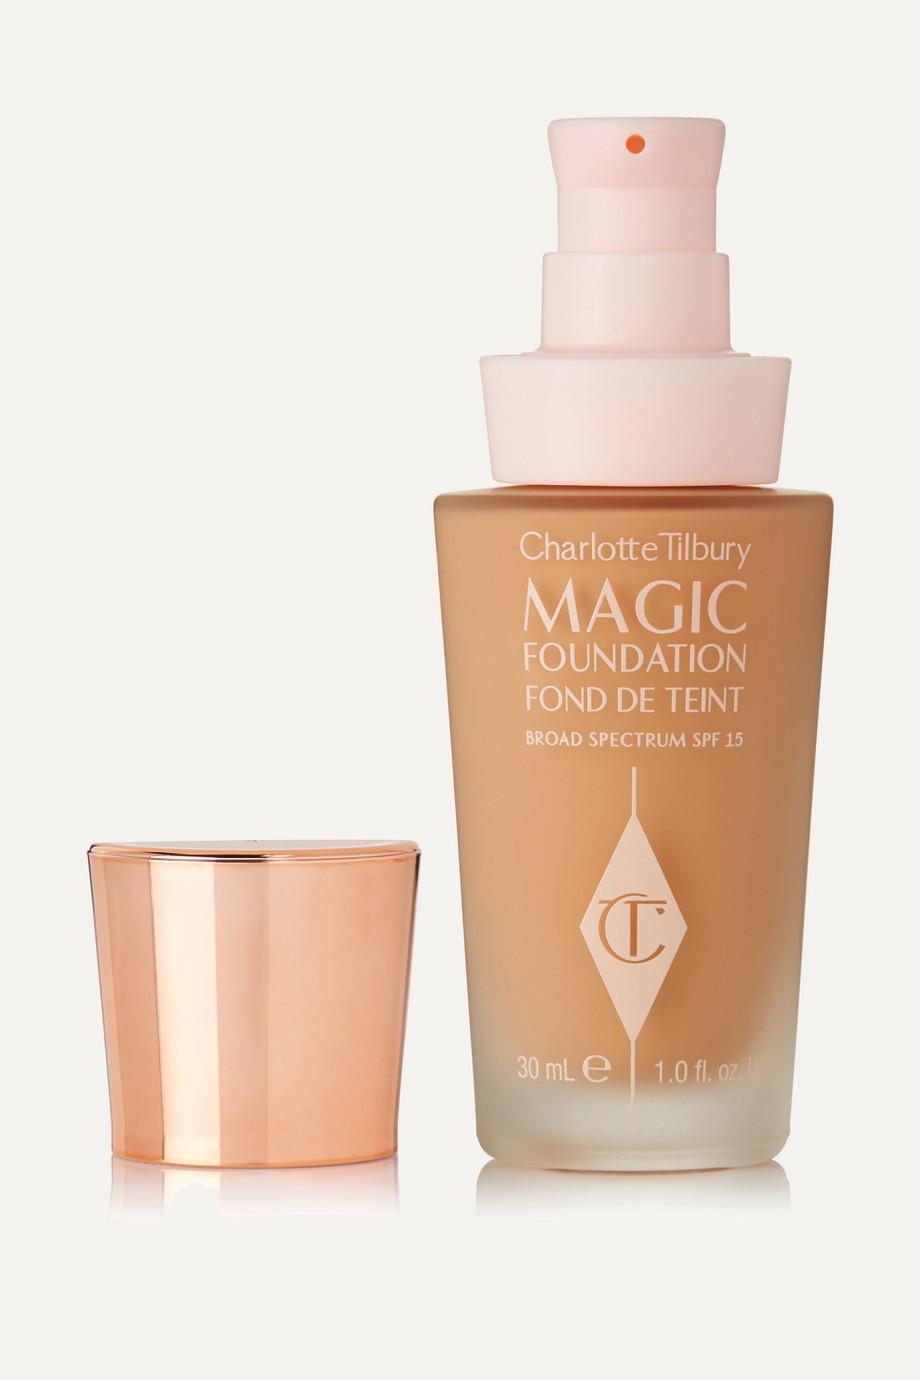 Charlotte Tilbury Magic Foundation Flawless Long-Lasting Coverage SPF15 - Shade 8.5, 30ml